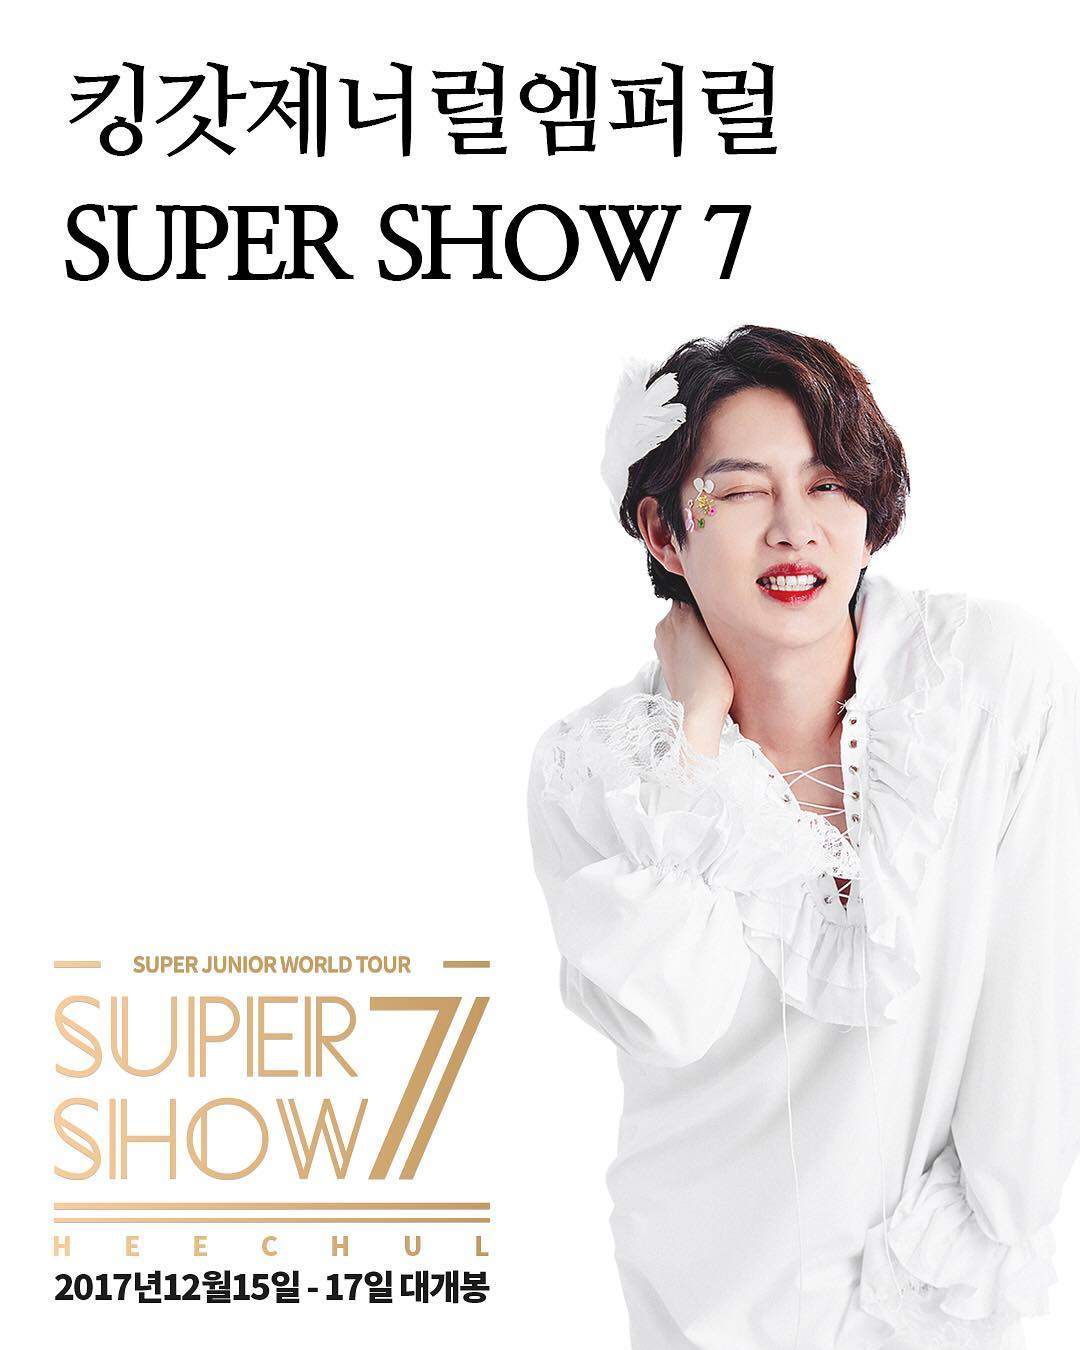 Super Junior第7次世界巡迴演唱會也將開始了,「Super Junior World Tour -